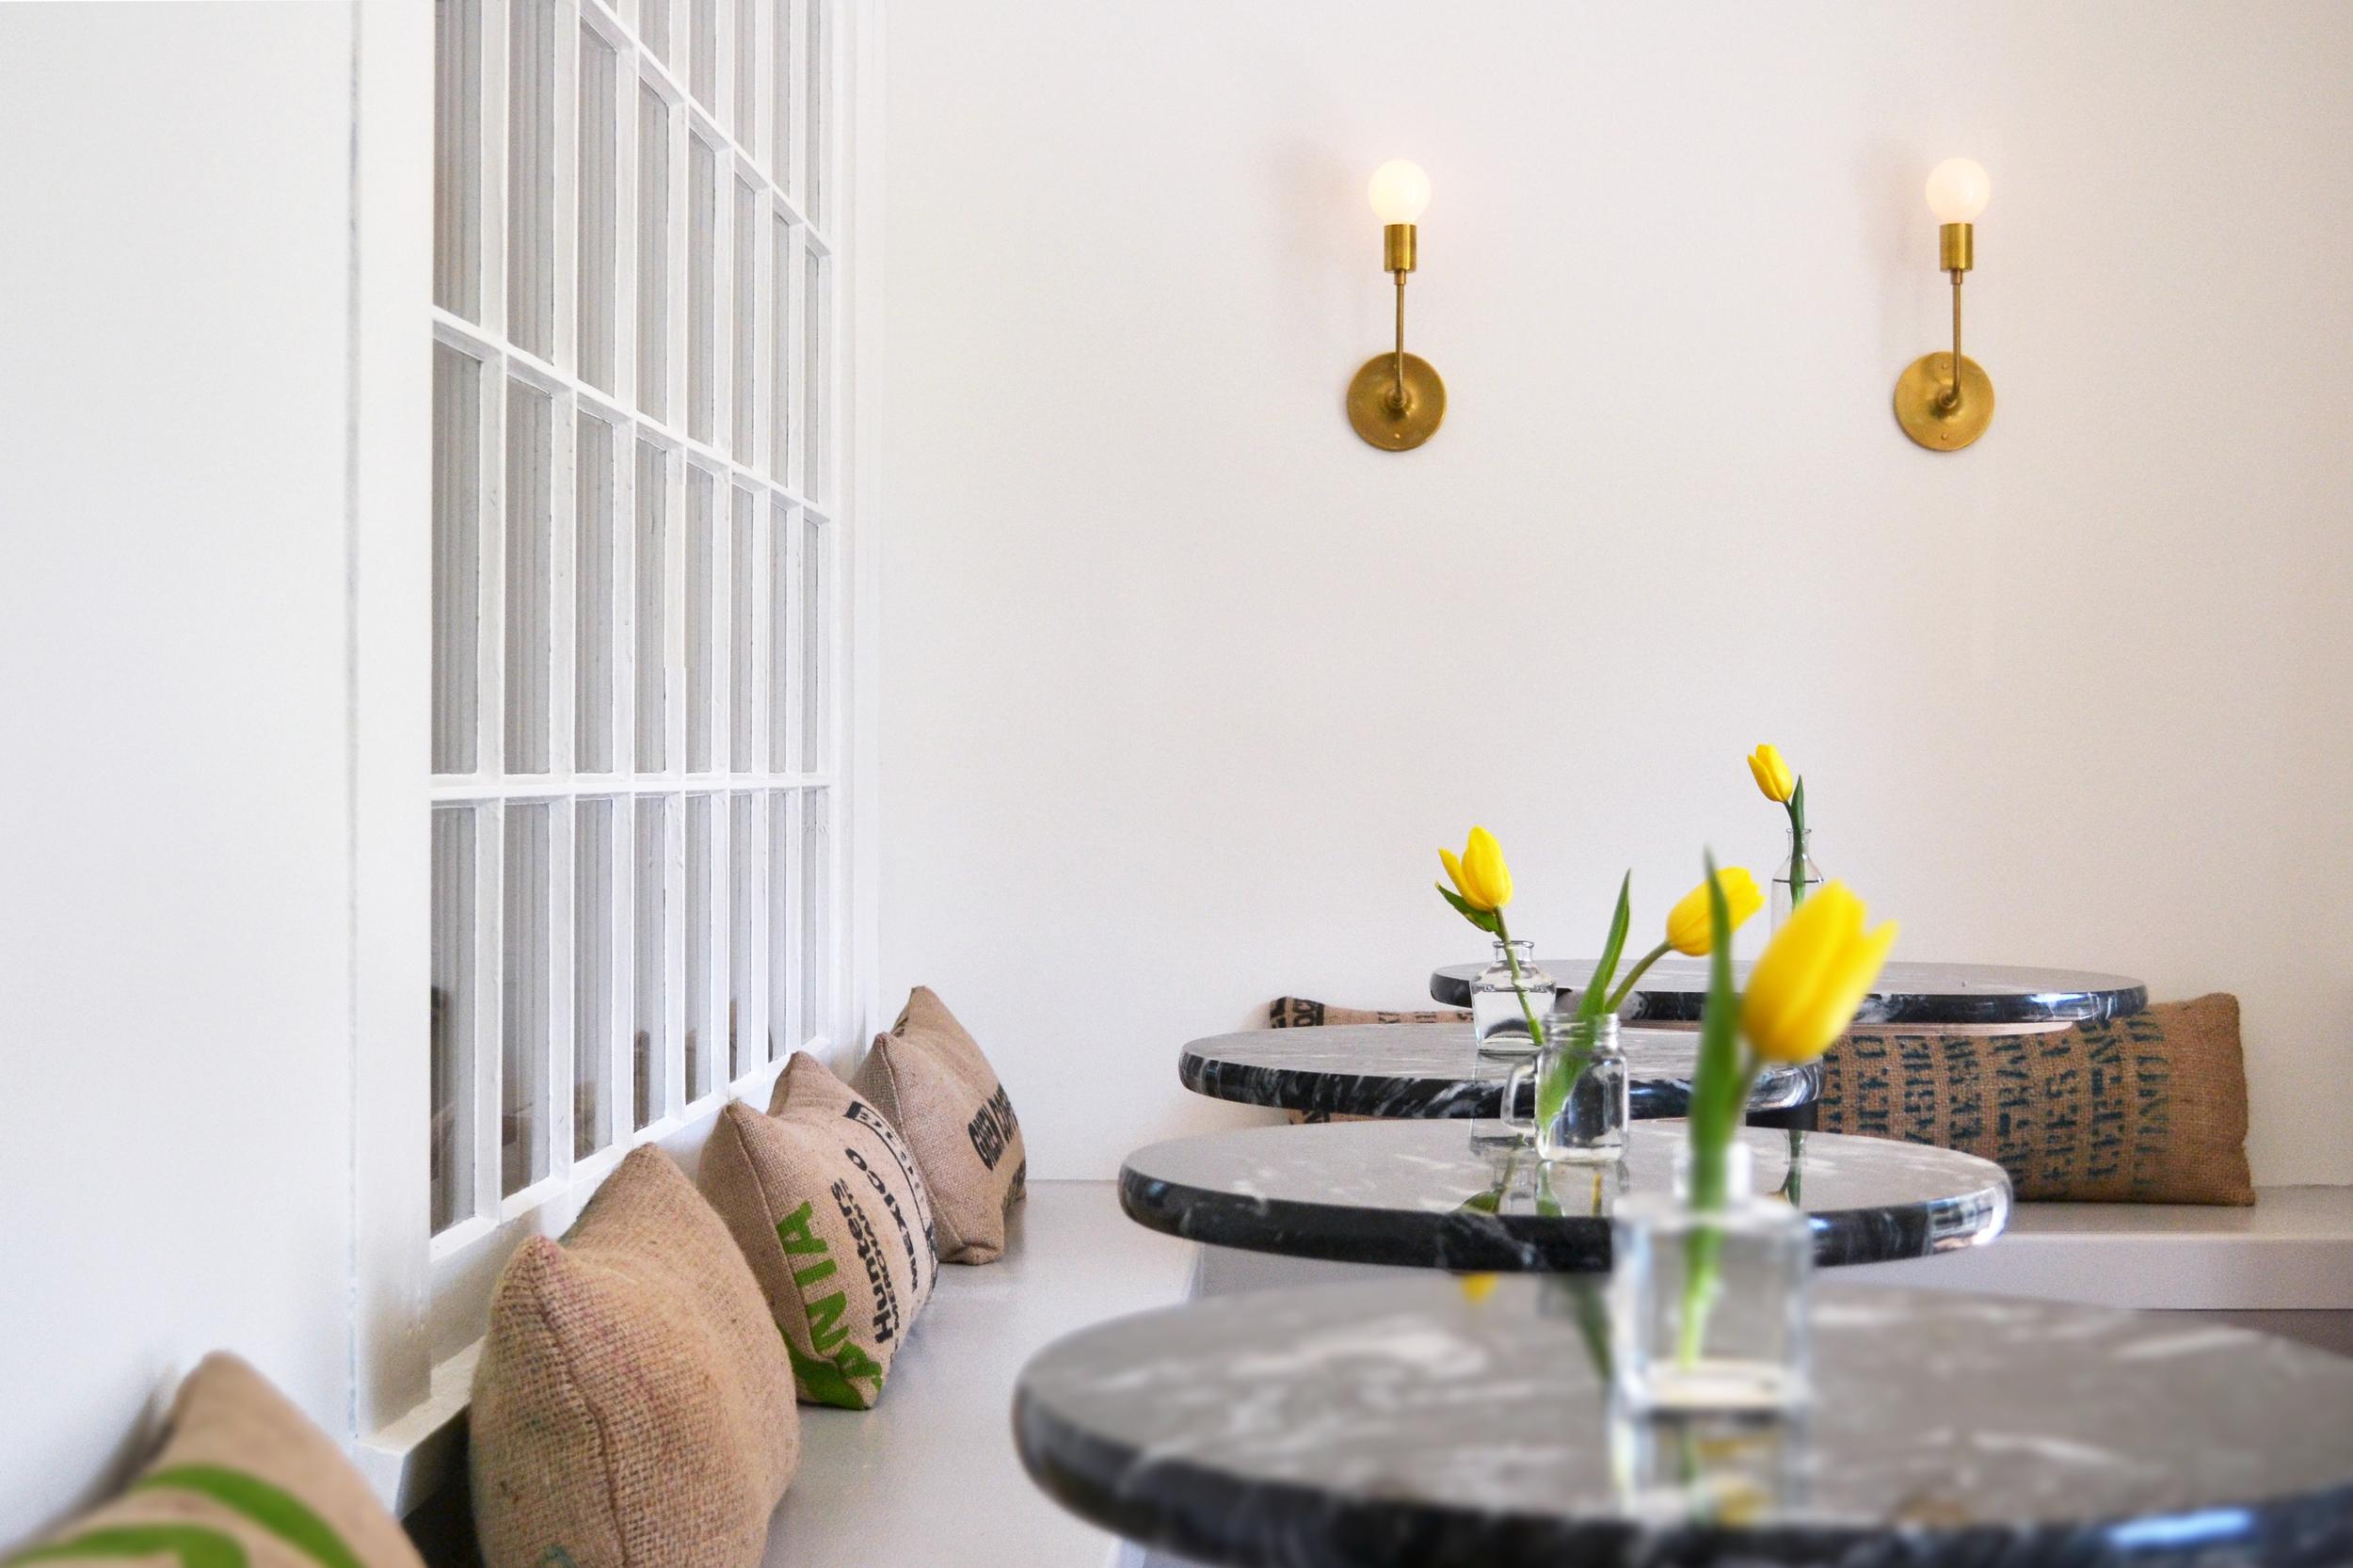 banquette seating coffee shop2.jpg